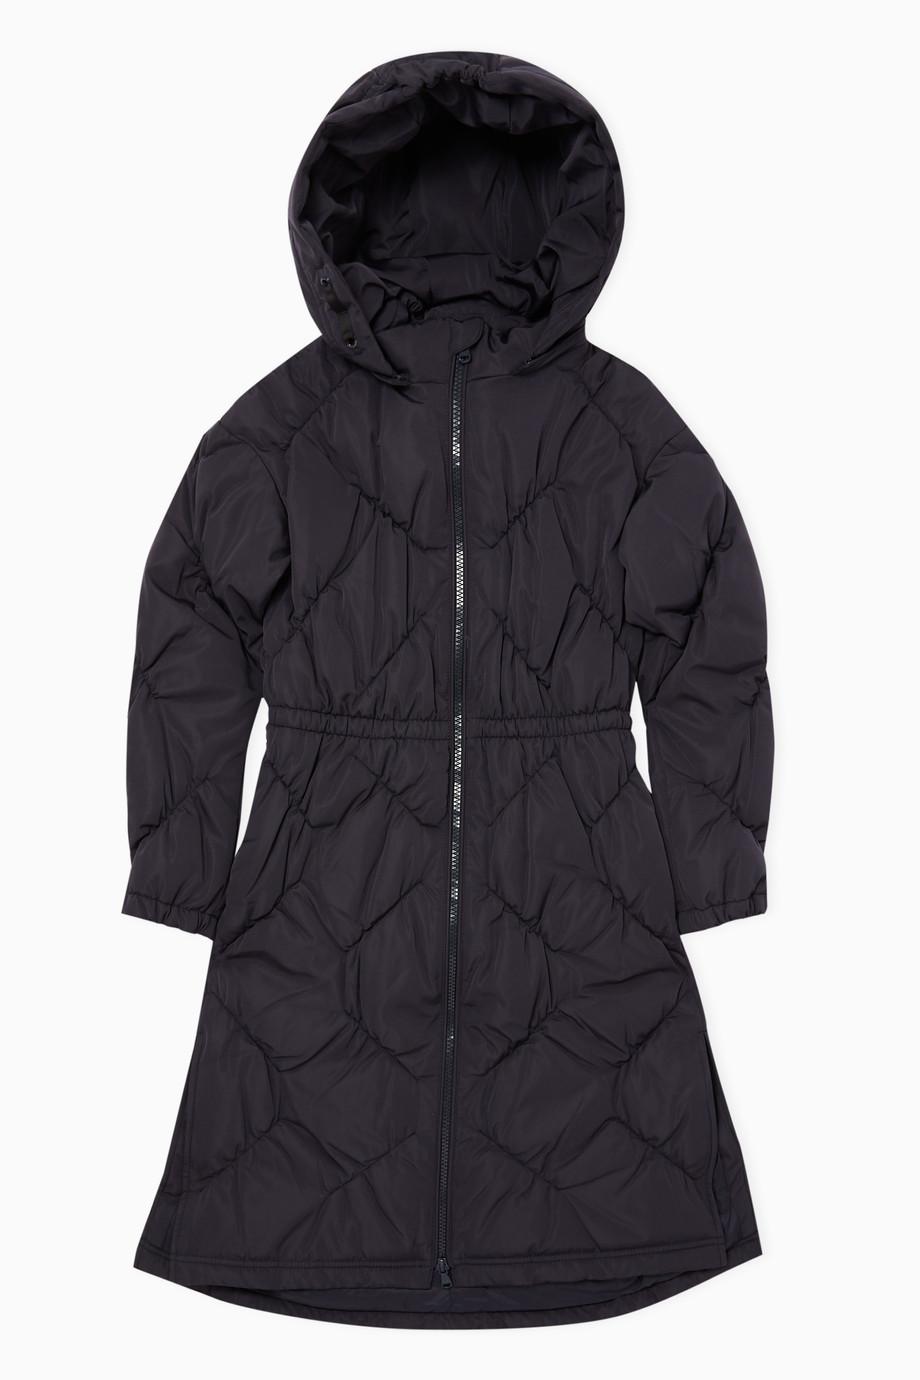 ba7aa529bc Shop Emporio Armani Blue Long Puffer Hooded Jacket for Kids | Ounass UAE